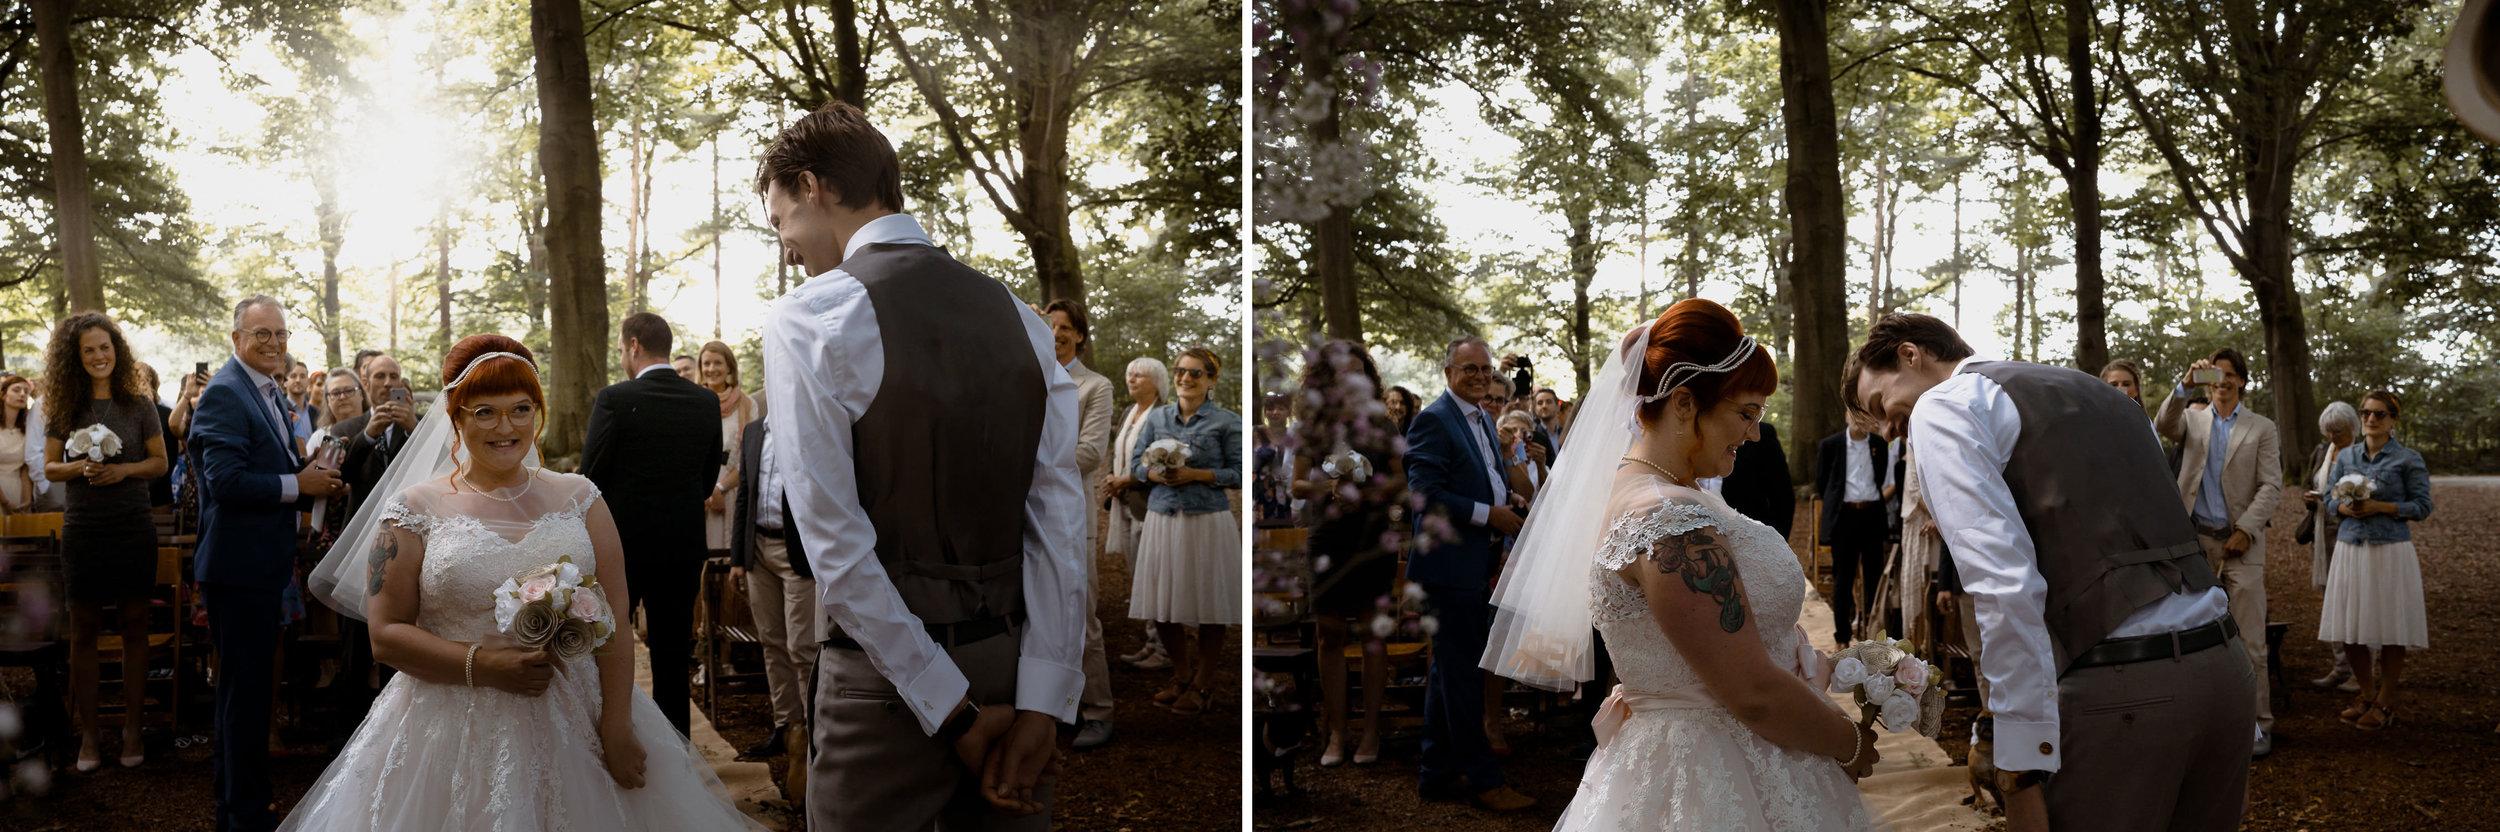 amsterdam-wedding-photographer-bruidsfotografie-trouwfotograaf-mark-hadden-Lucie-Luuk-085 copy.jpg